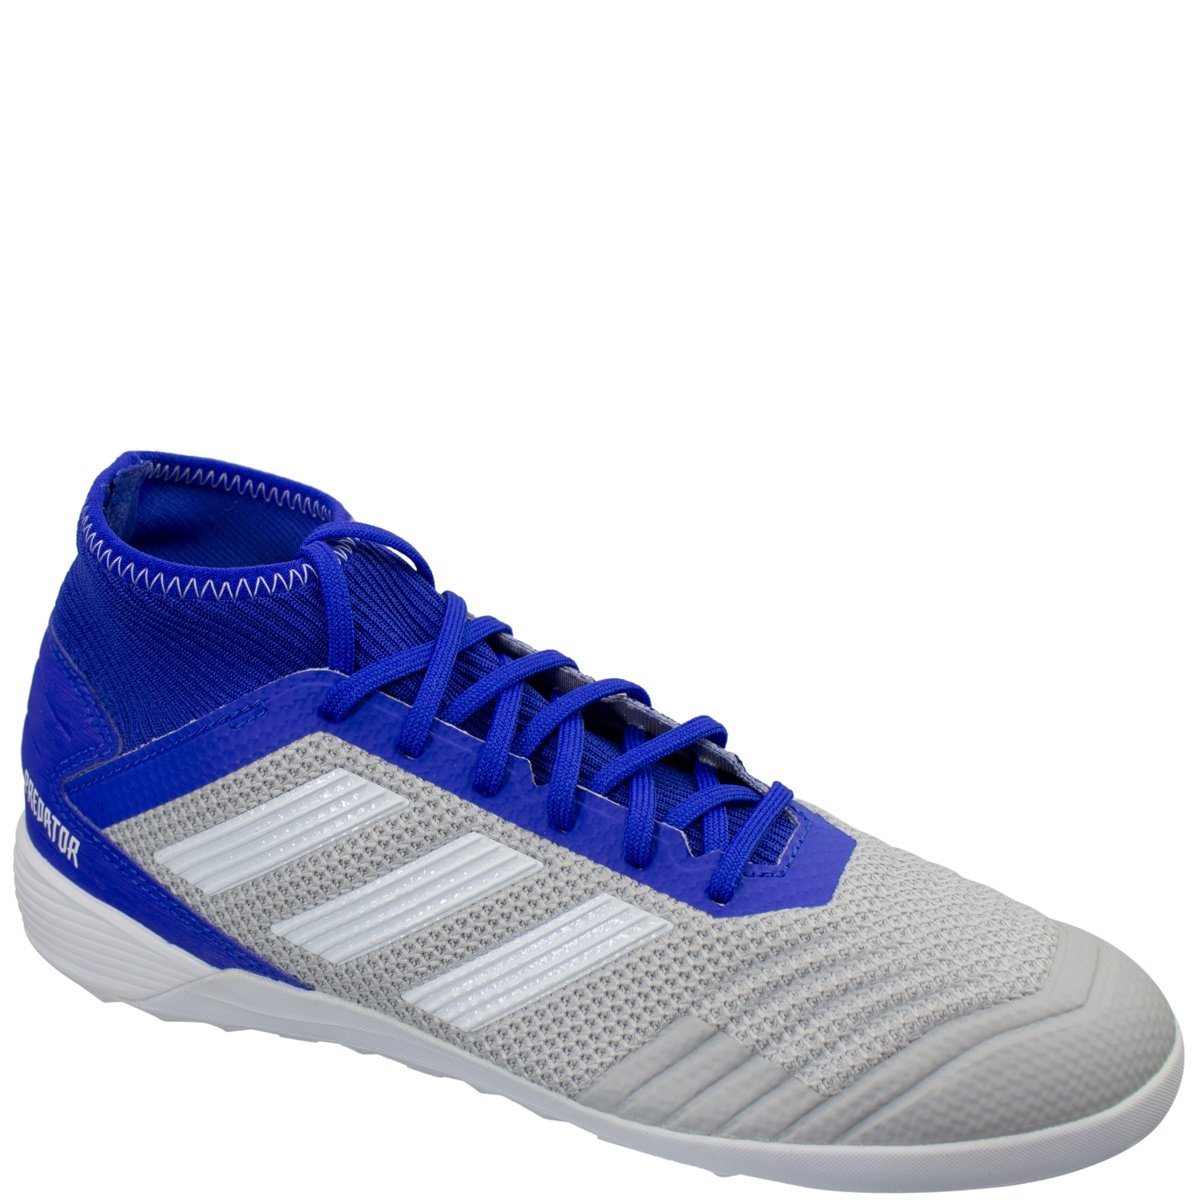 e941df9a2 Chuteira Masculina Futsal Adidas Predator 19.3 D97963 - Cinza/Azul | Bizz  Store